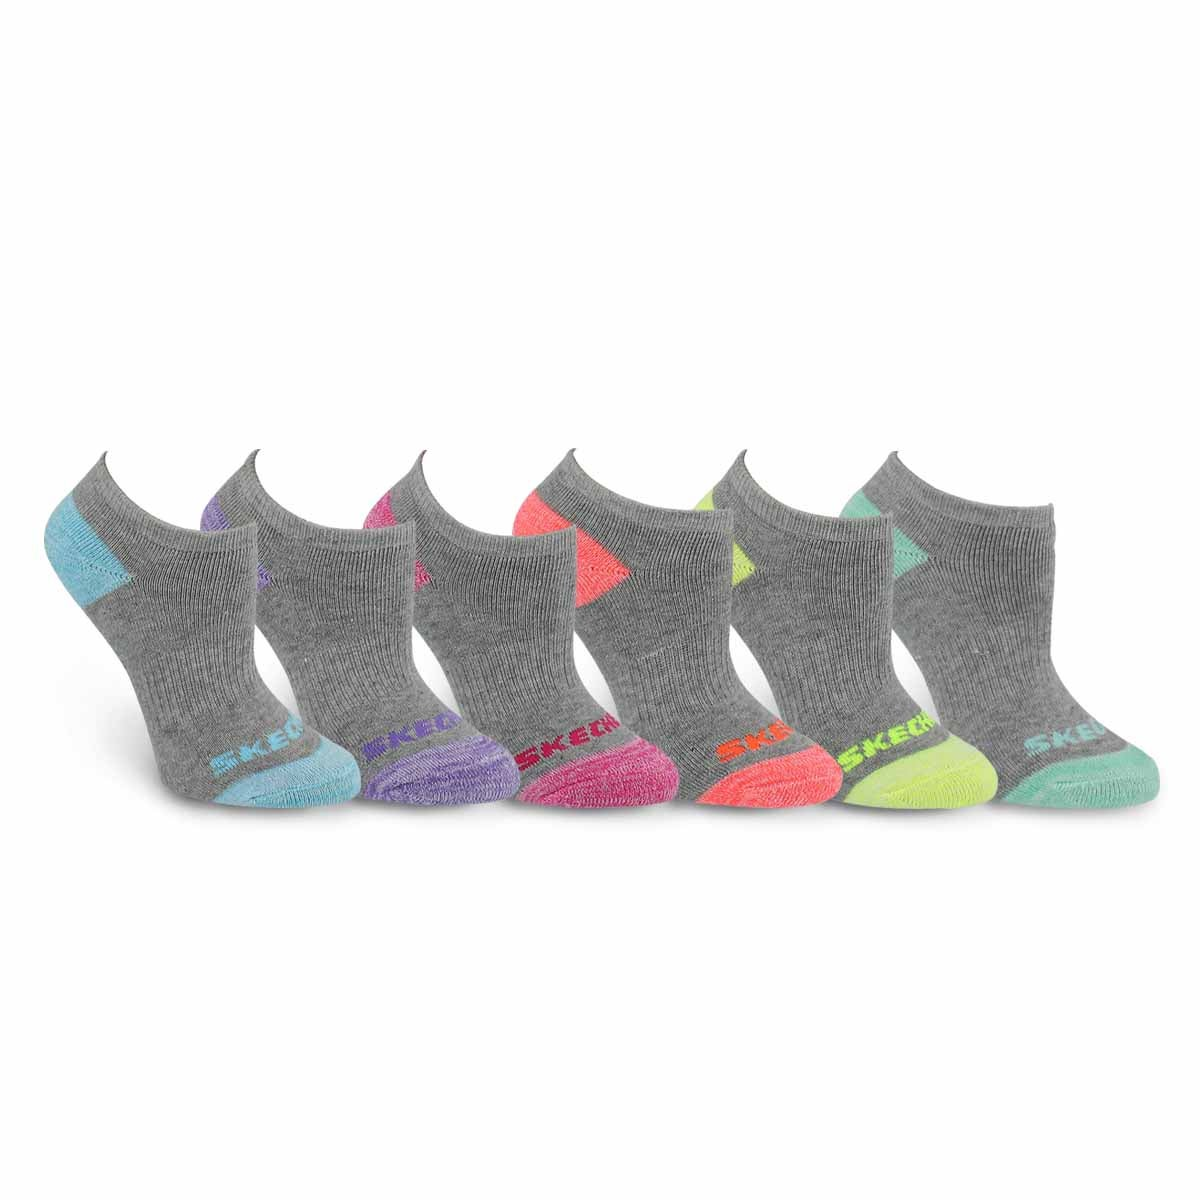 Grls NoShow FullTerry MED gry sock 6pk